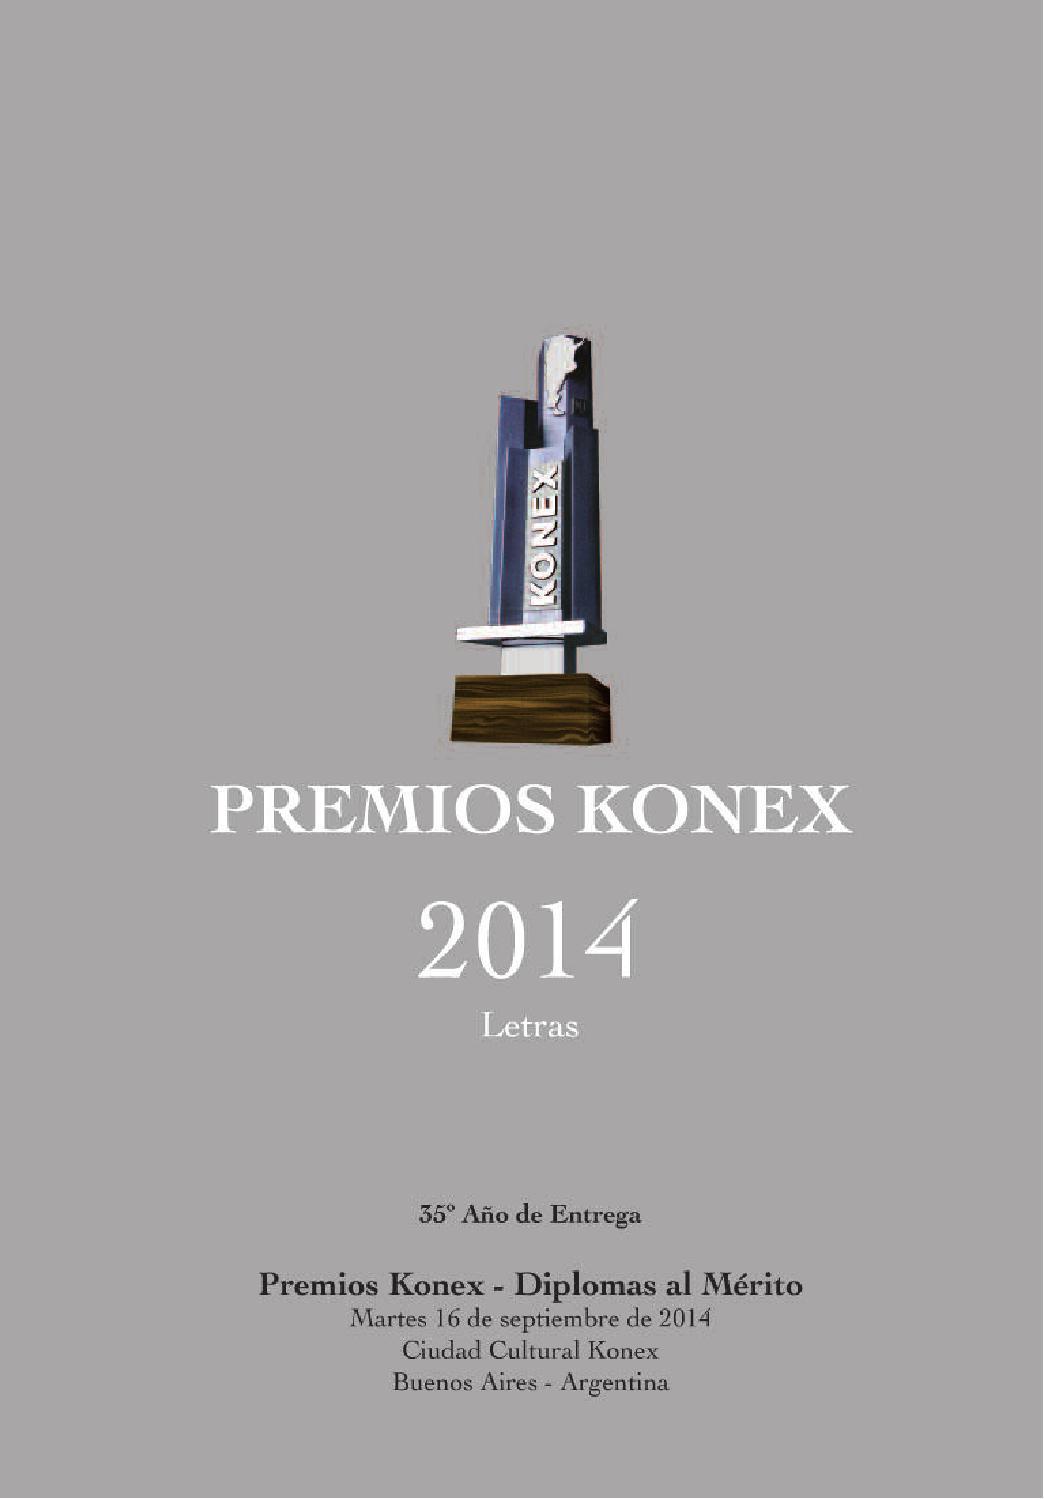 Programa Premios Konex 2014: Diplomas al Mérito by